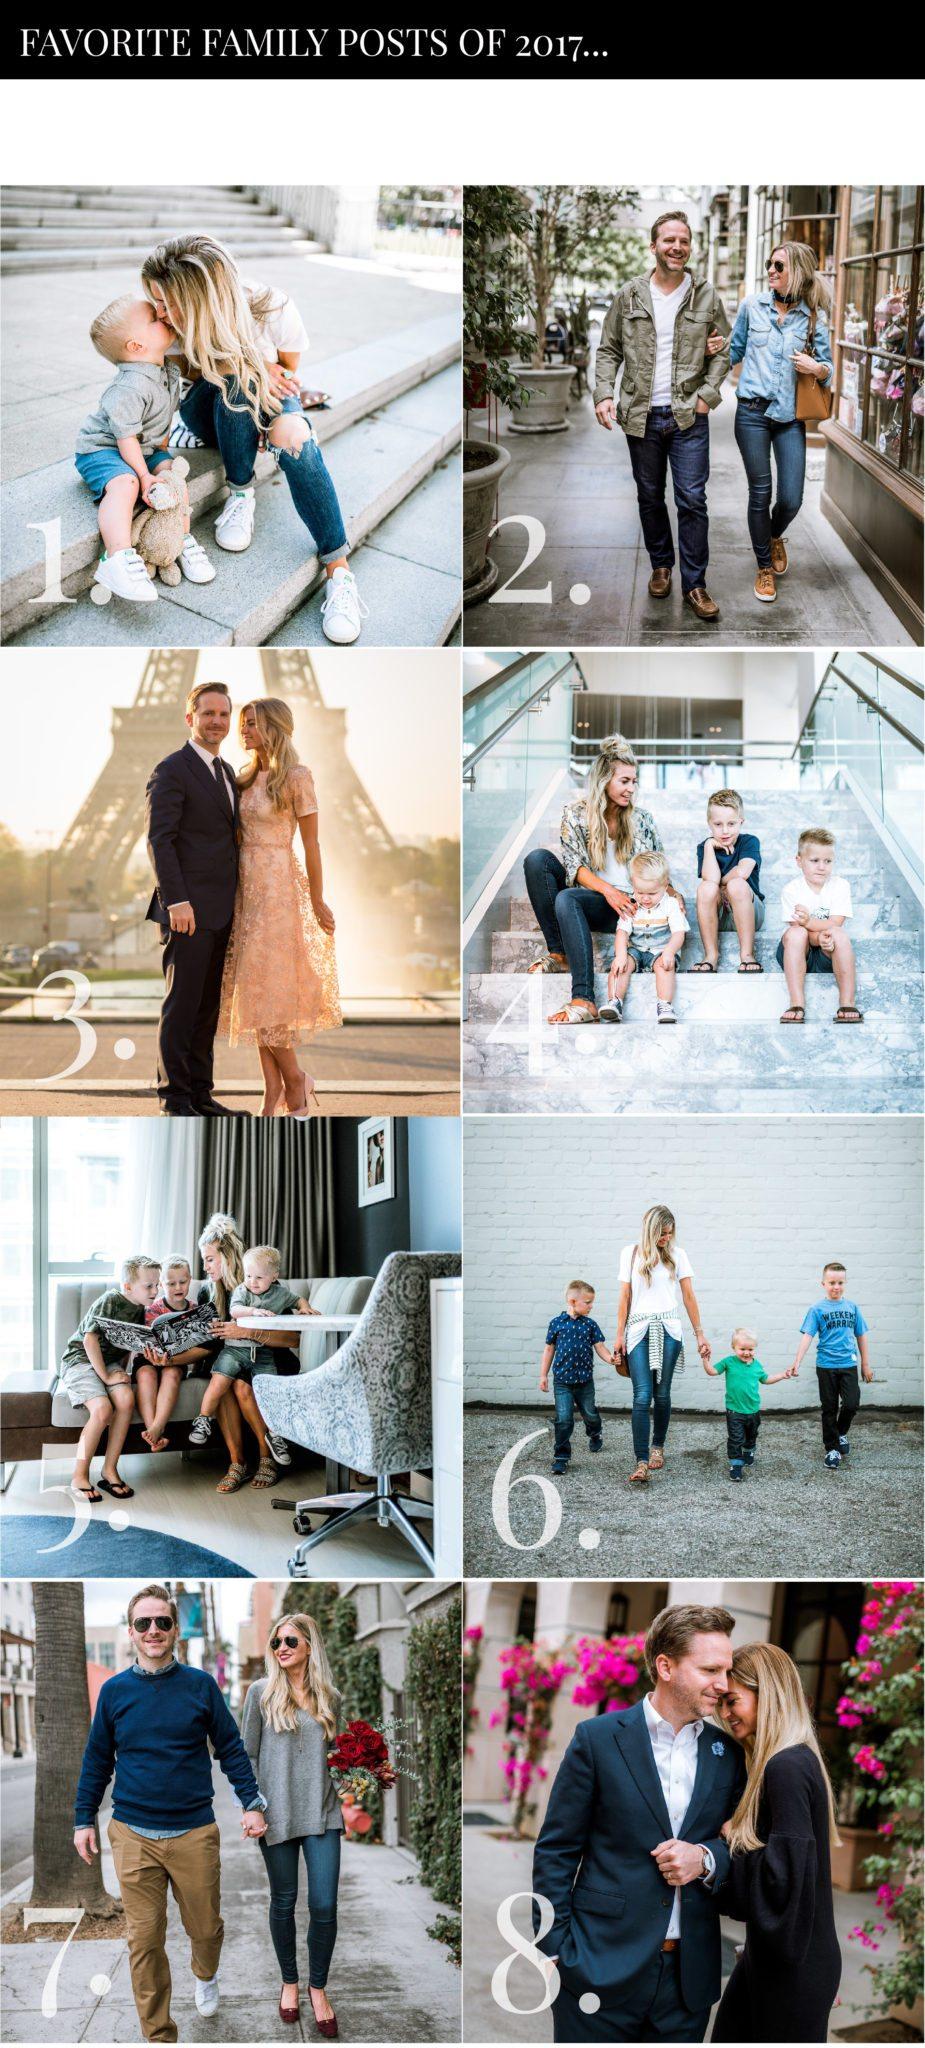 Best Elle Apparel Family Posts of 2017